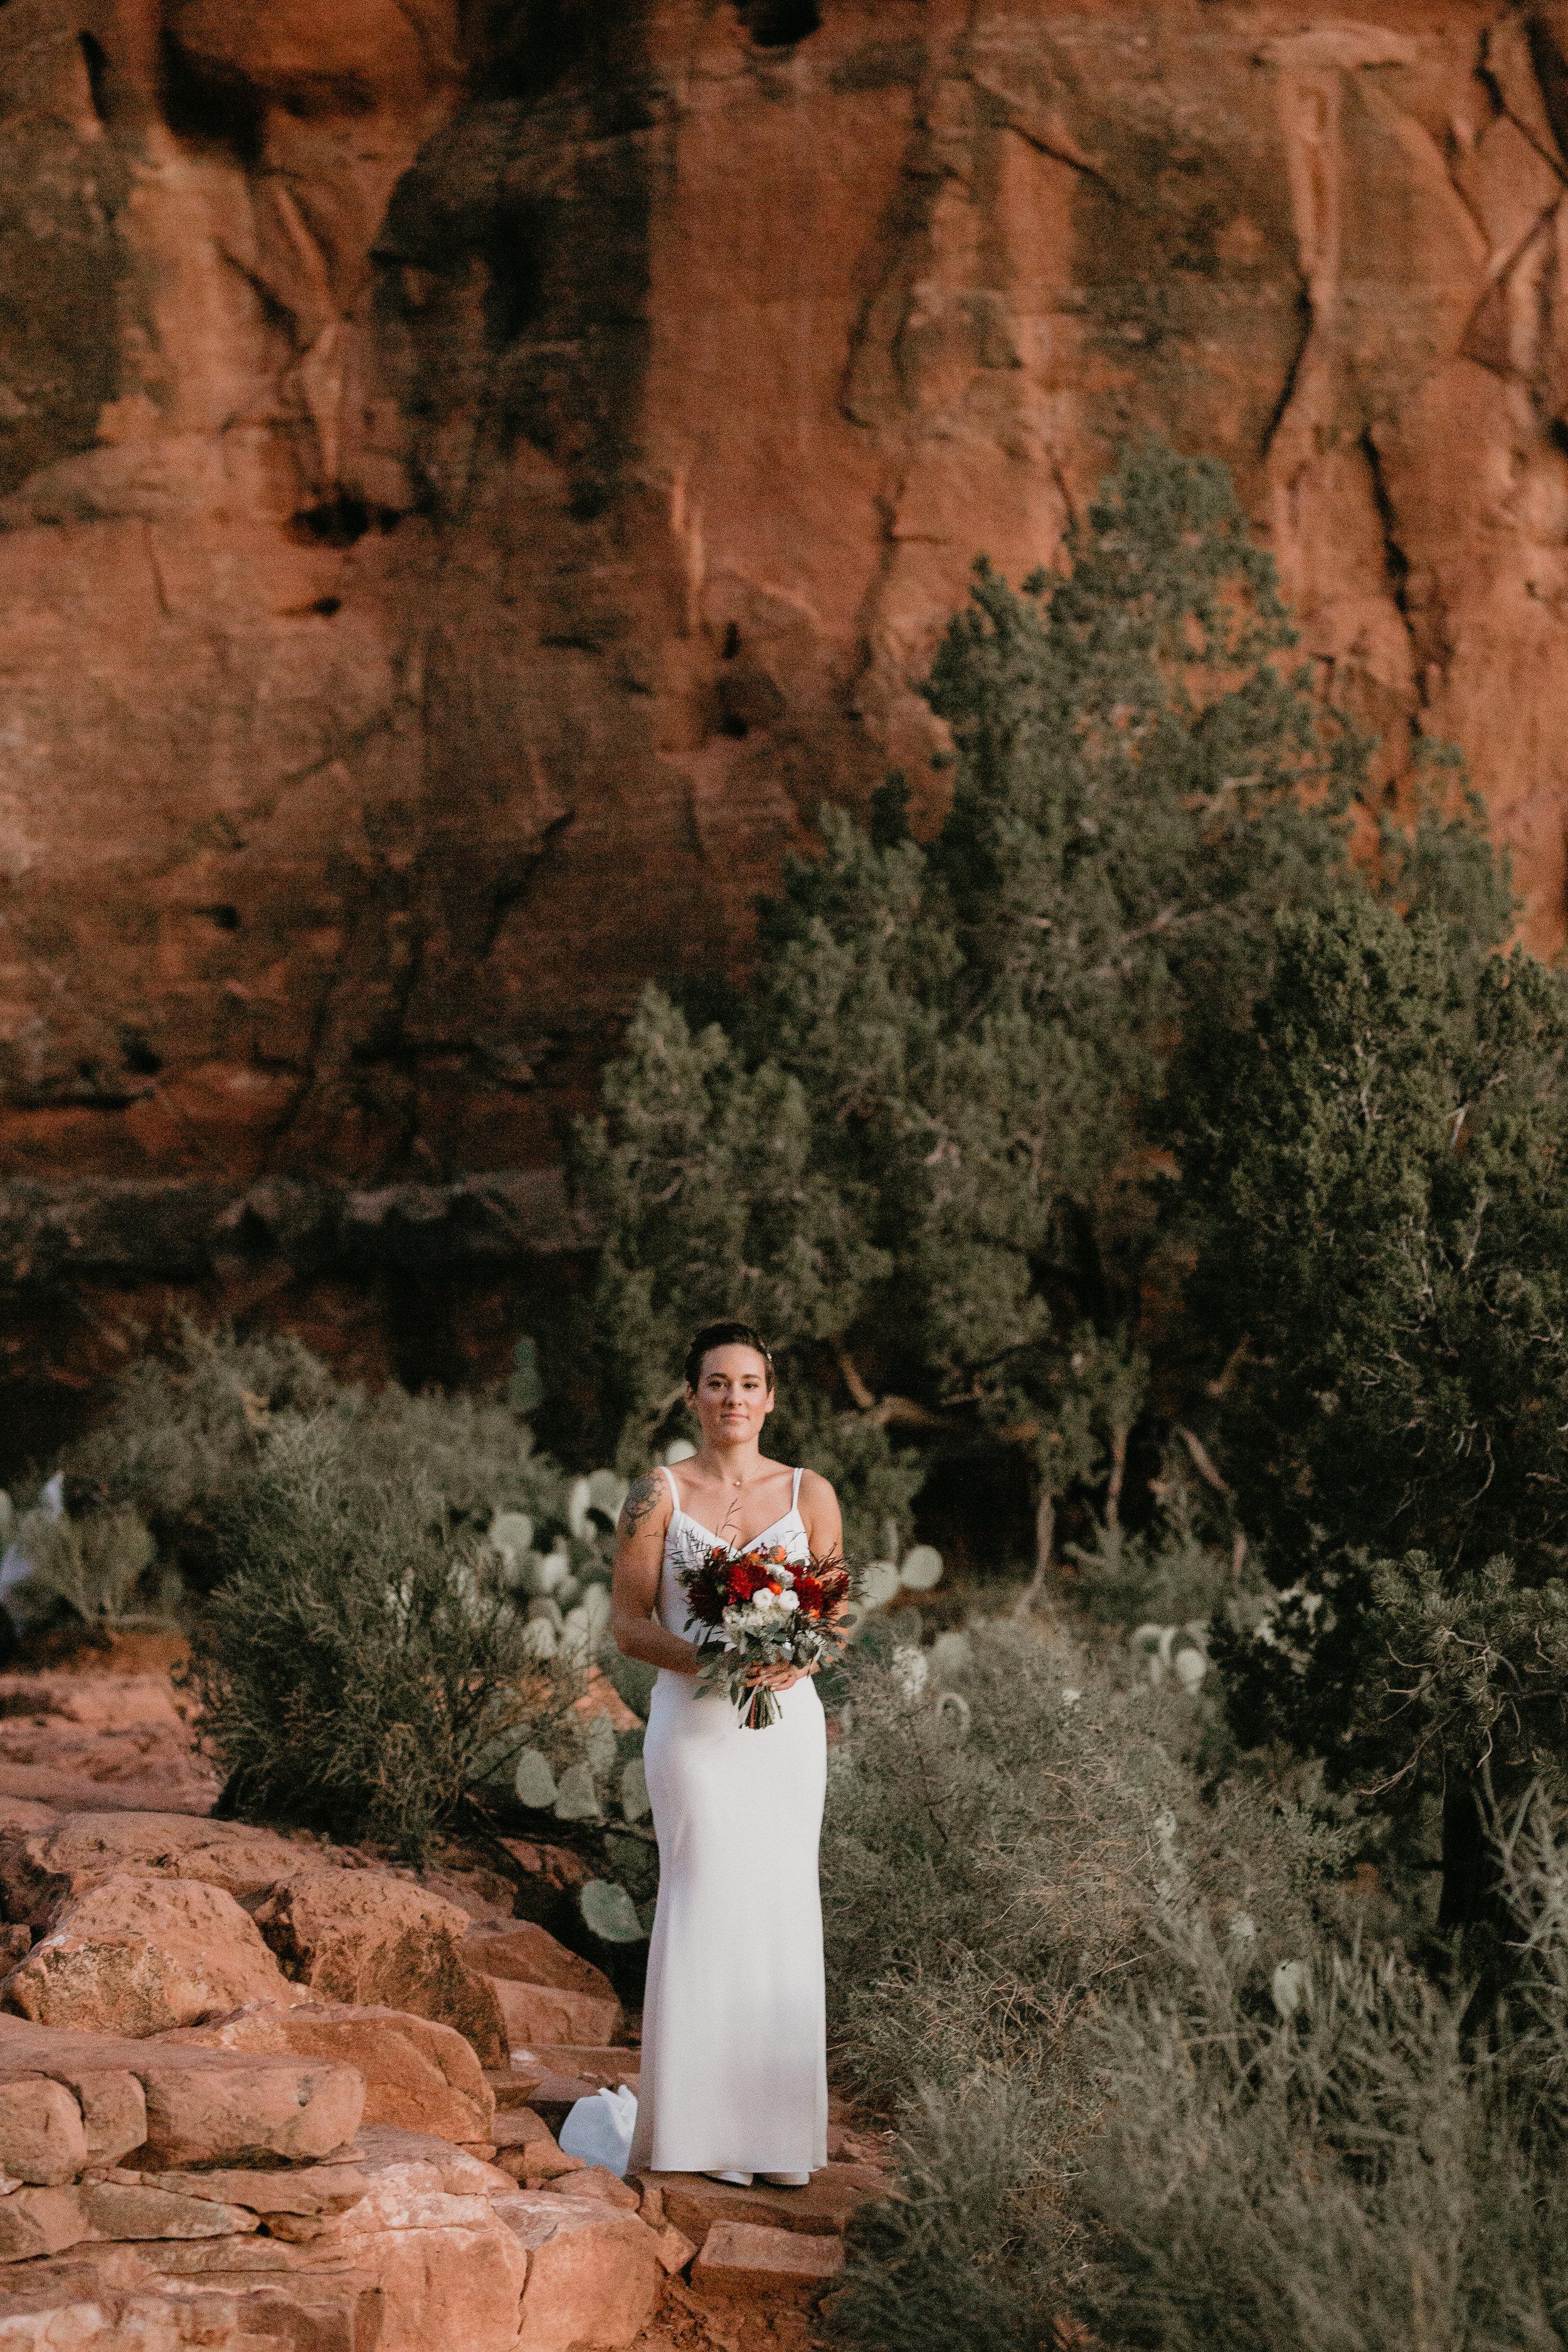 nicole-daacke-photography-sedona-arizona-destination-elopement-wedding-photographer-catherdral-rock-hiking-elopement-sedona-river-elopement-photos-desert-rock-wedding-photographer-laid-back-spontaneous-elopement-3.jpg